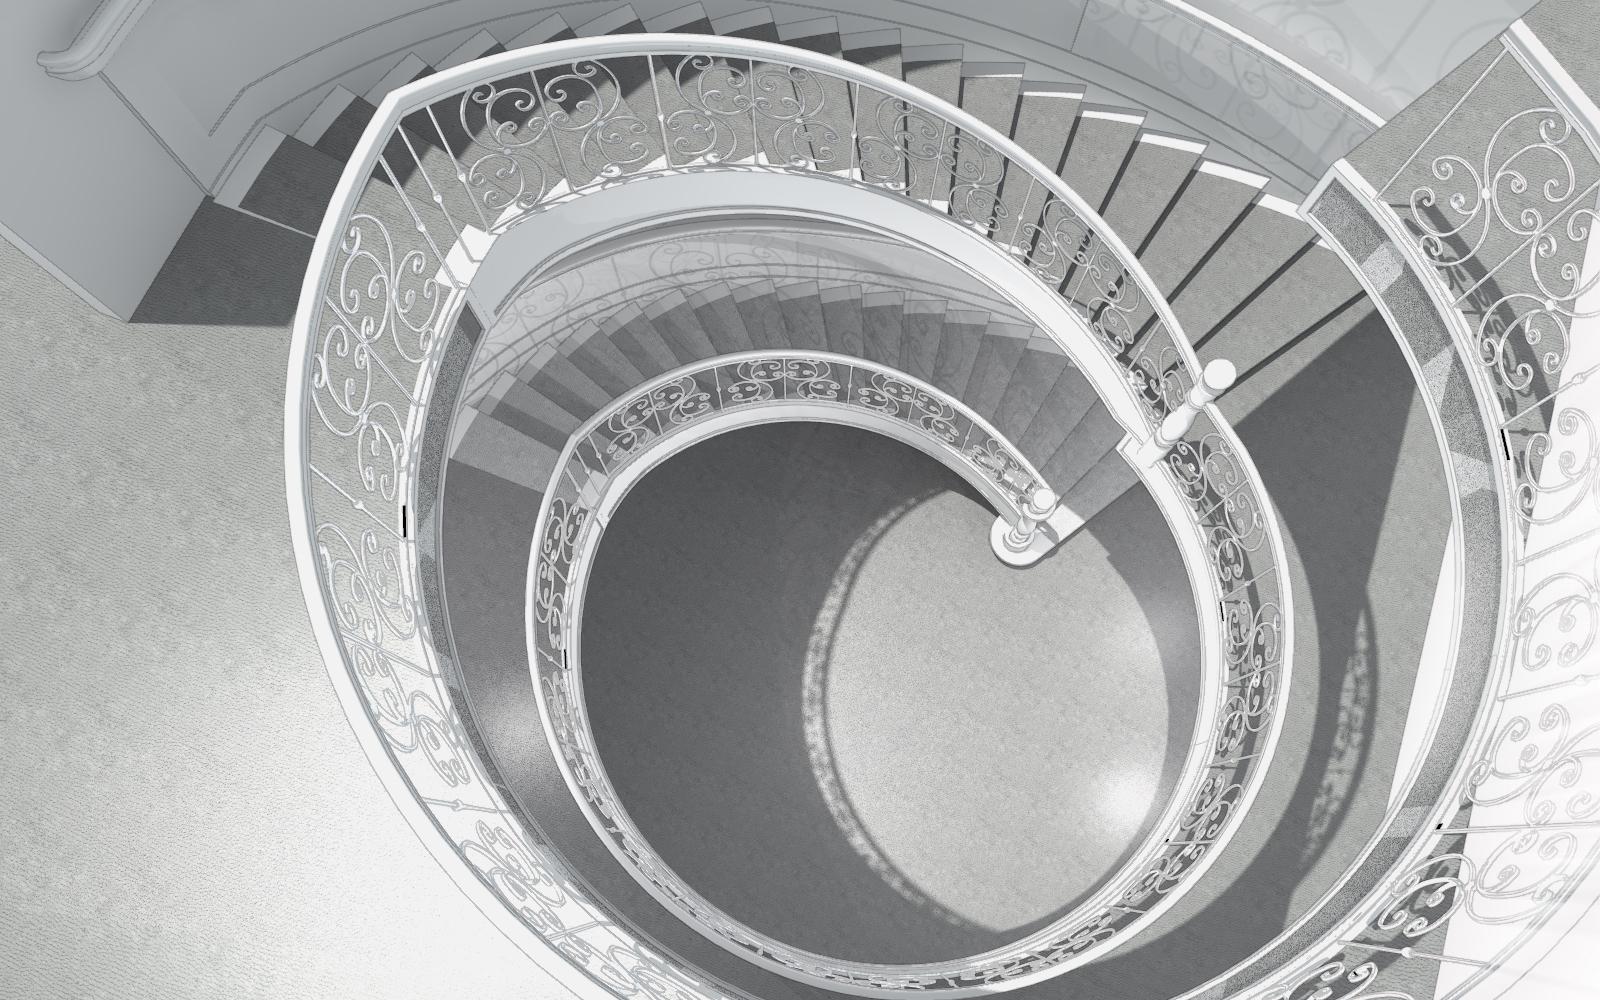 Staal, The art of living, stalendeur,